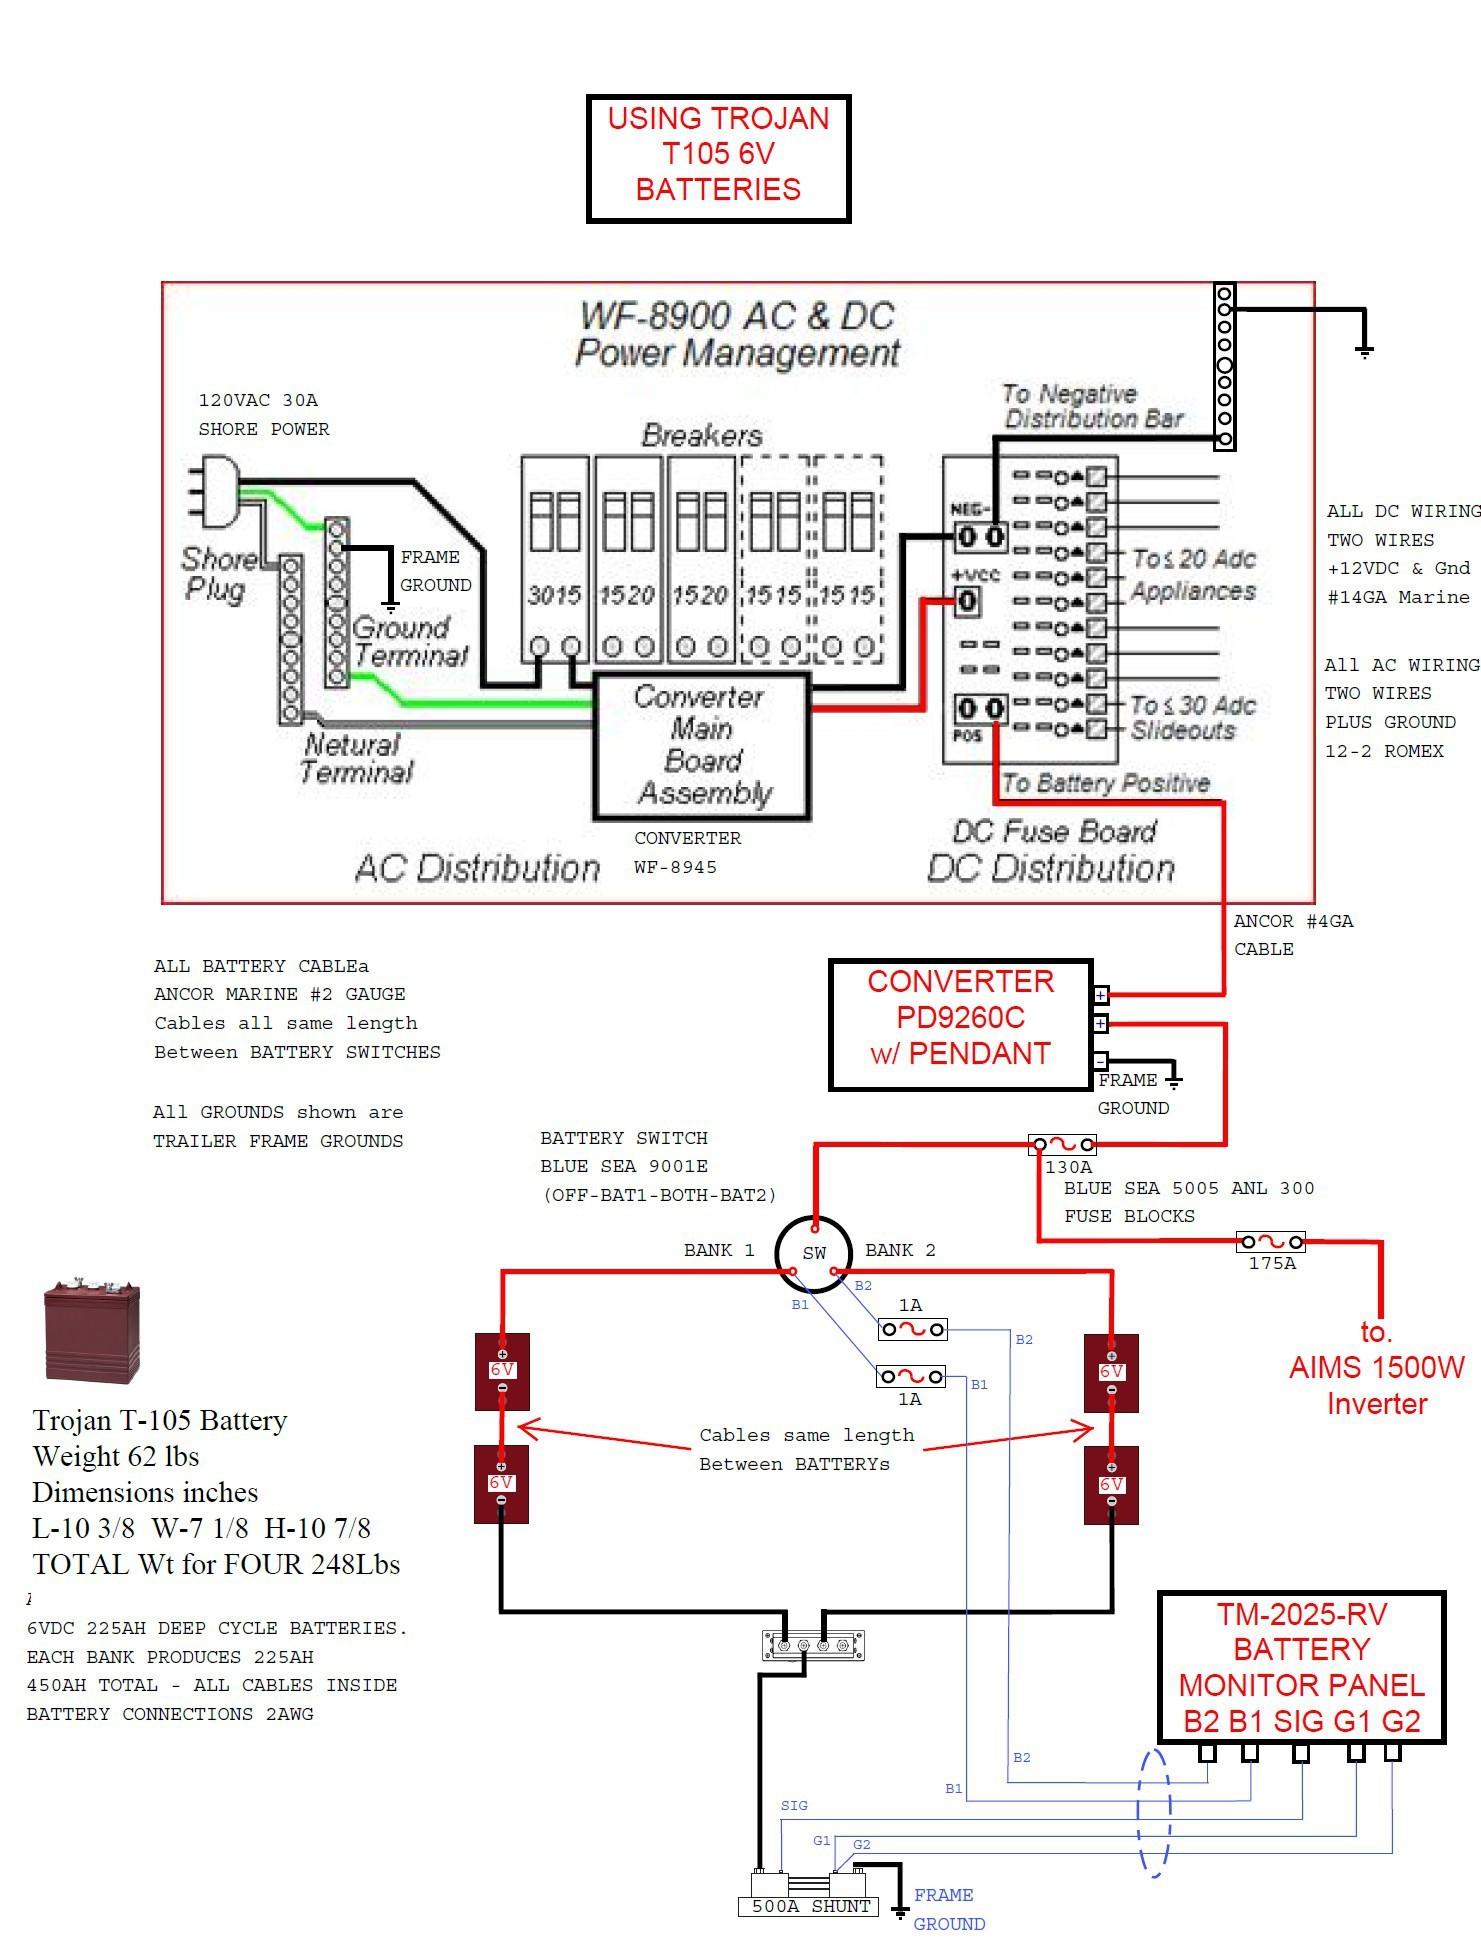 Rv Converter Wiring Diagram Elegant Rv Power Converter Wiring Diagram Fresh Nice Kib Monitor Panel